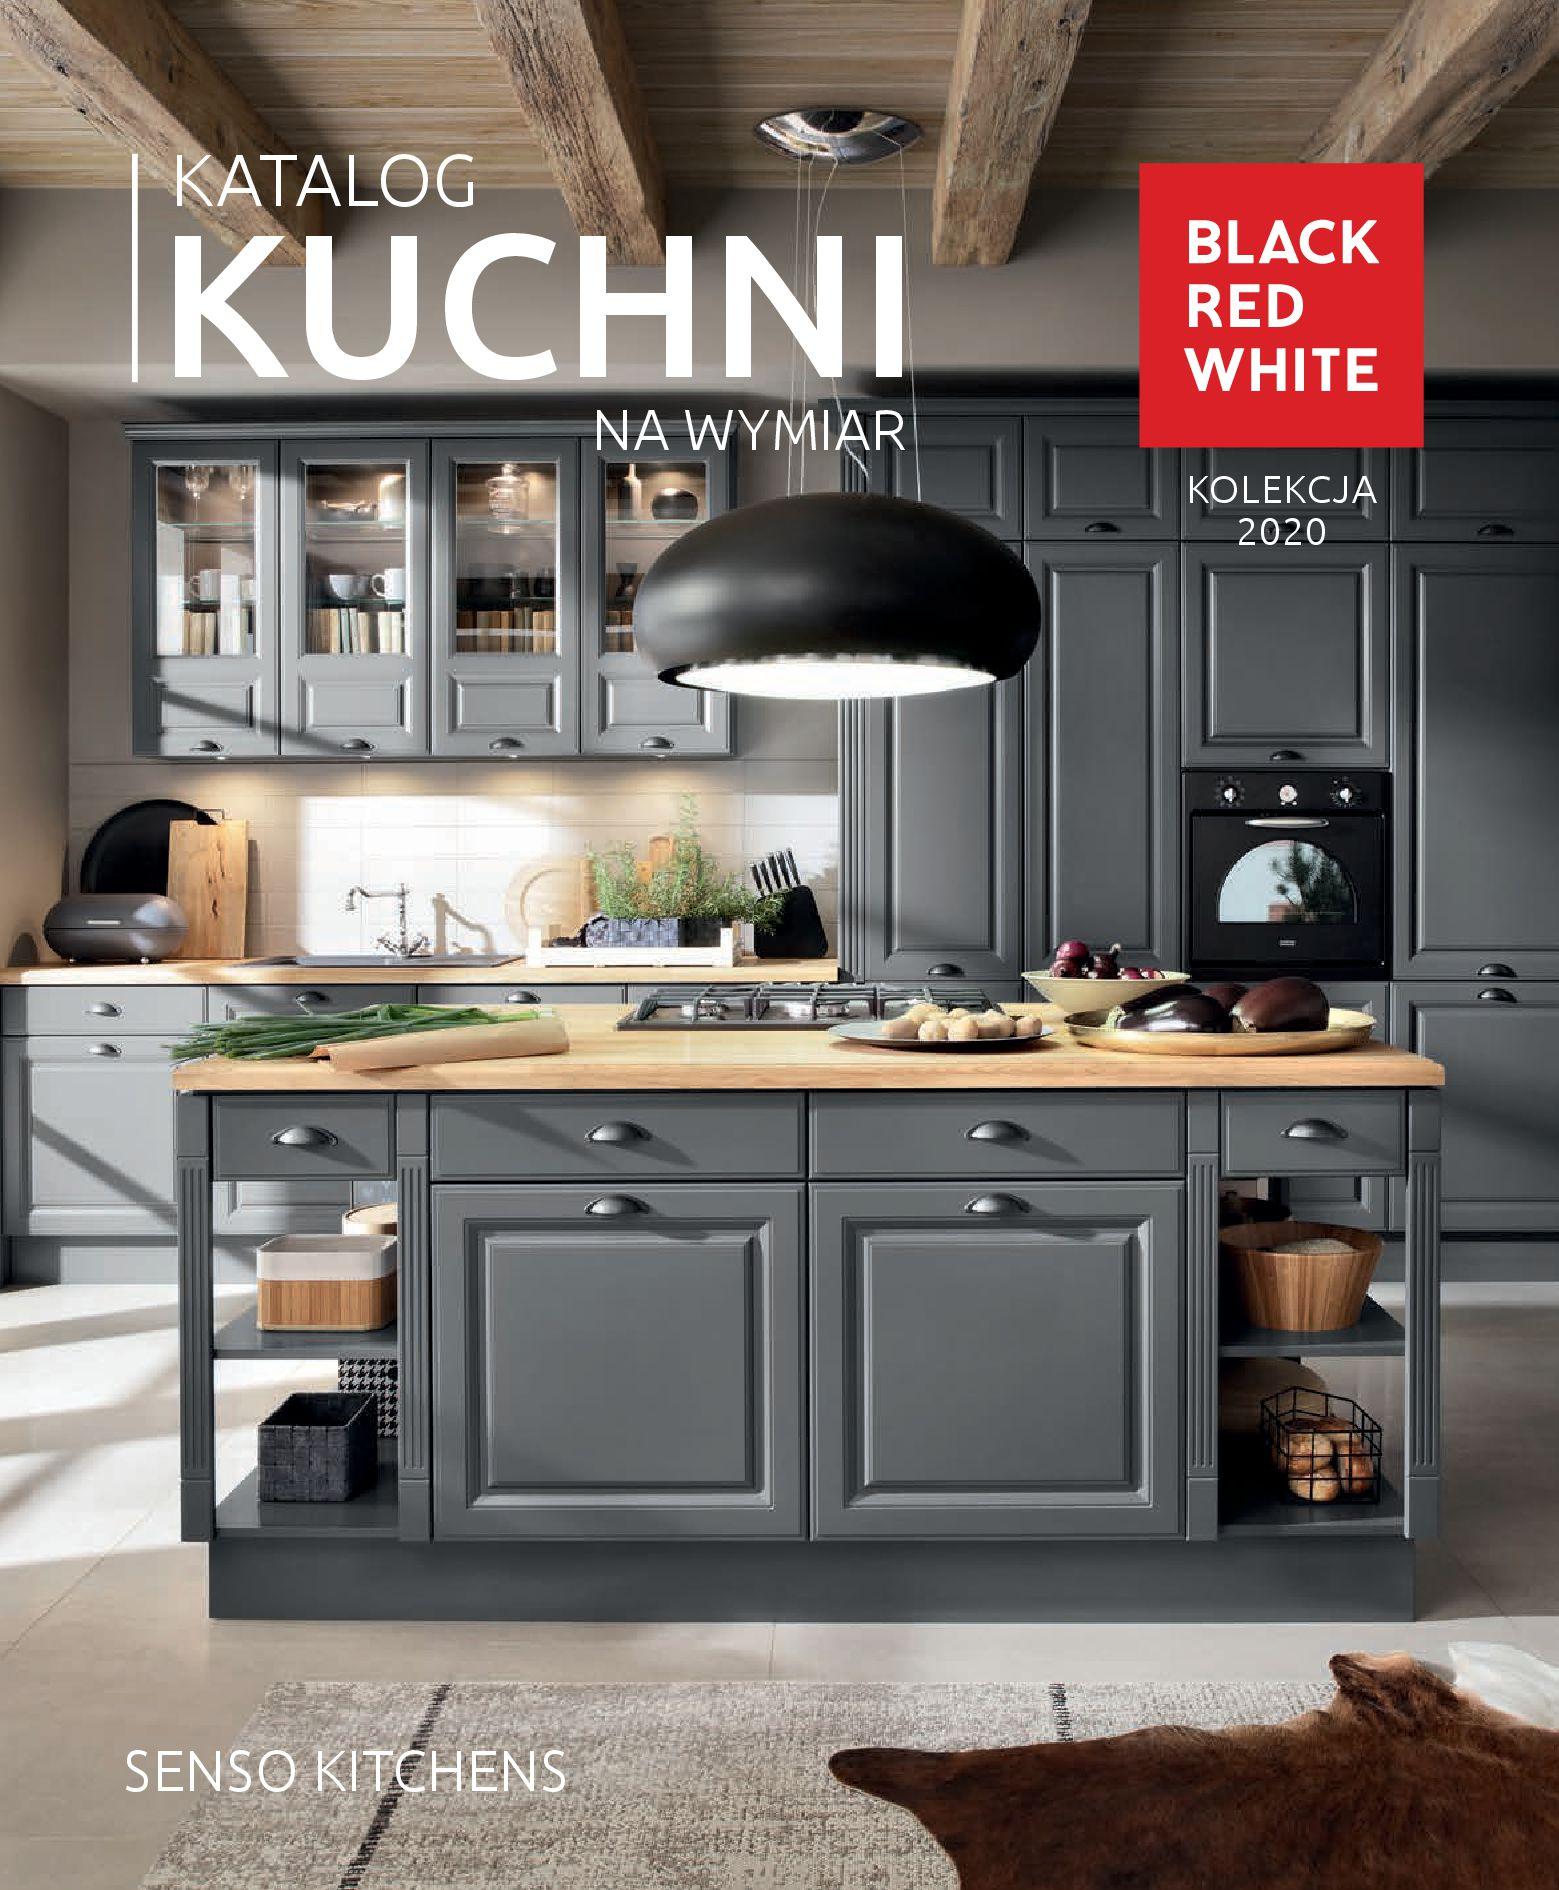 Gazetka Black Red White - Katalog - Kuchnie na wymiar-31.12.2019-31.12.2020-page-1